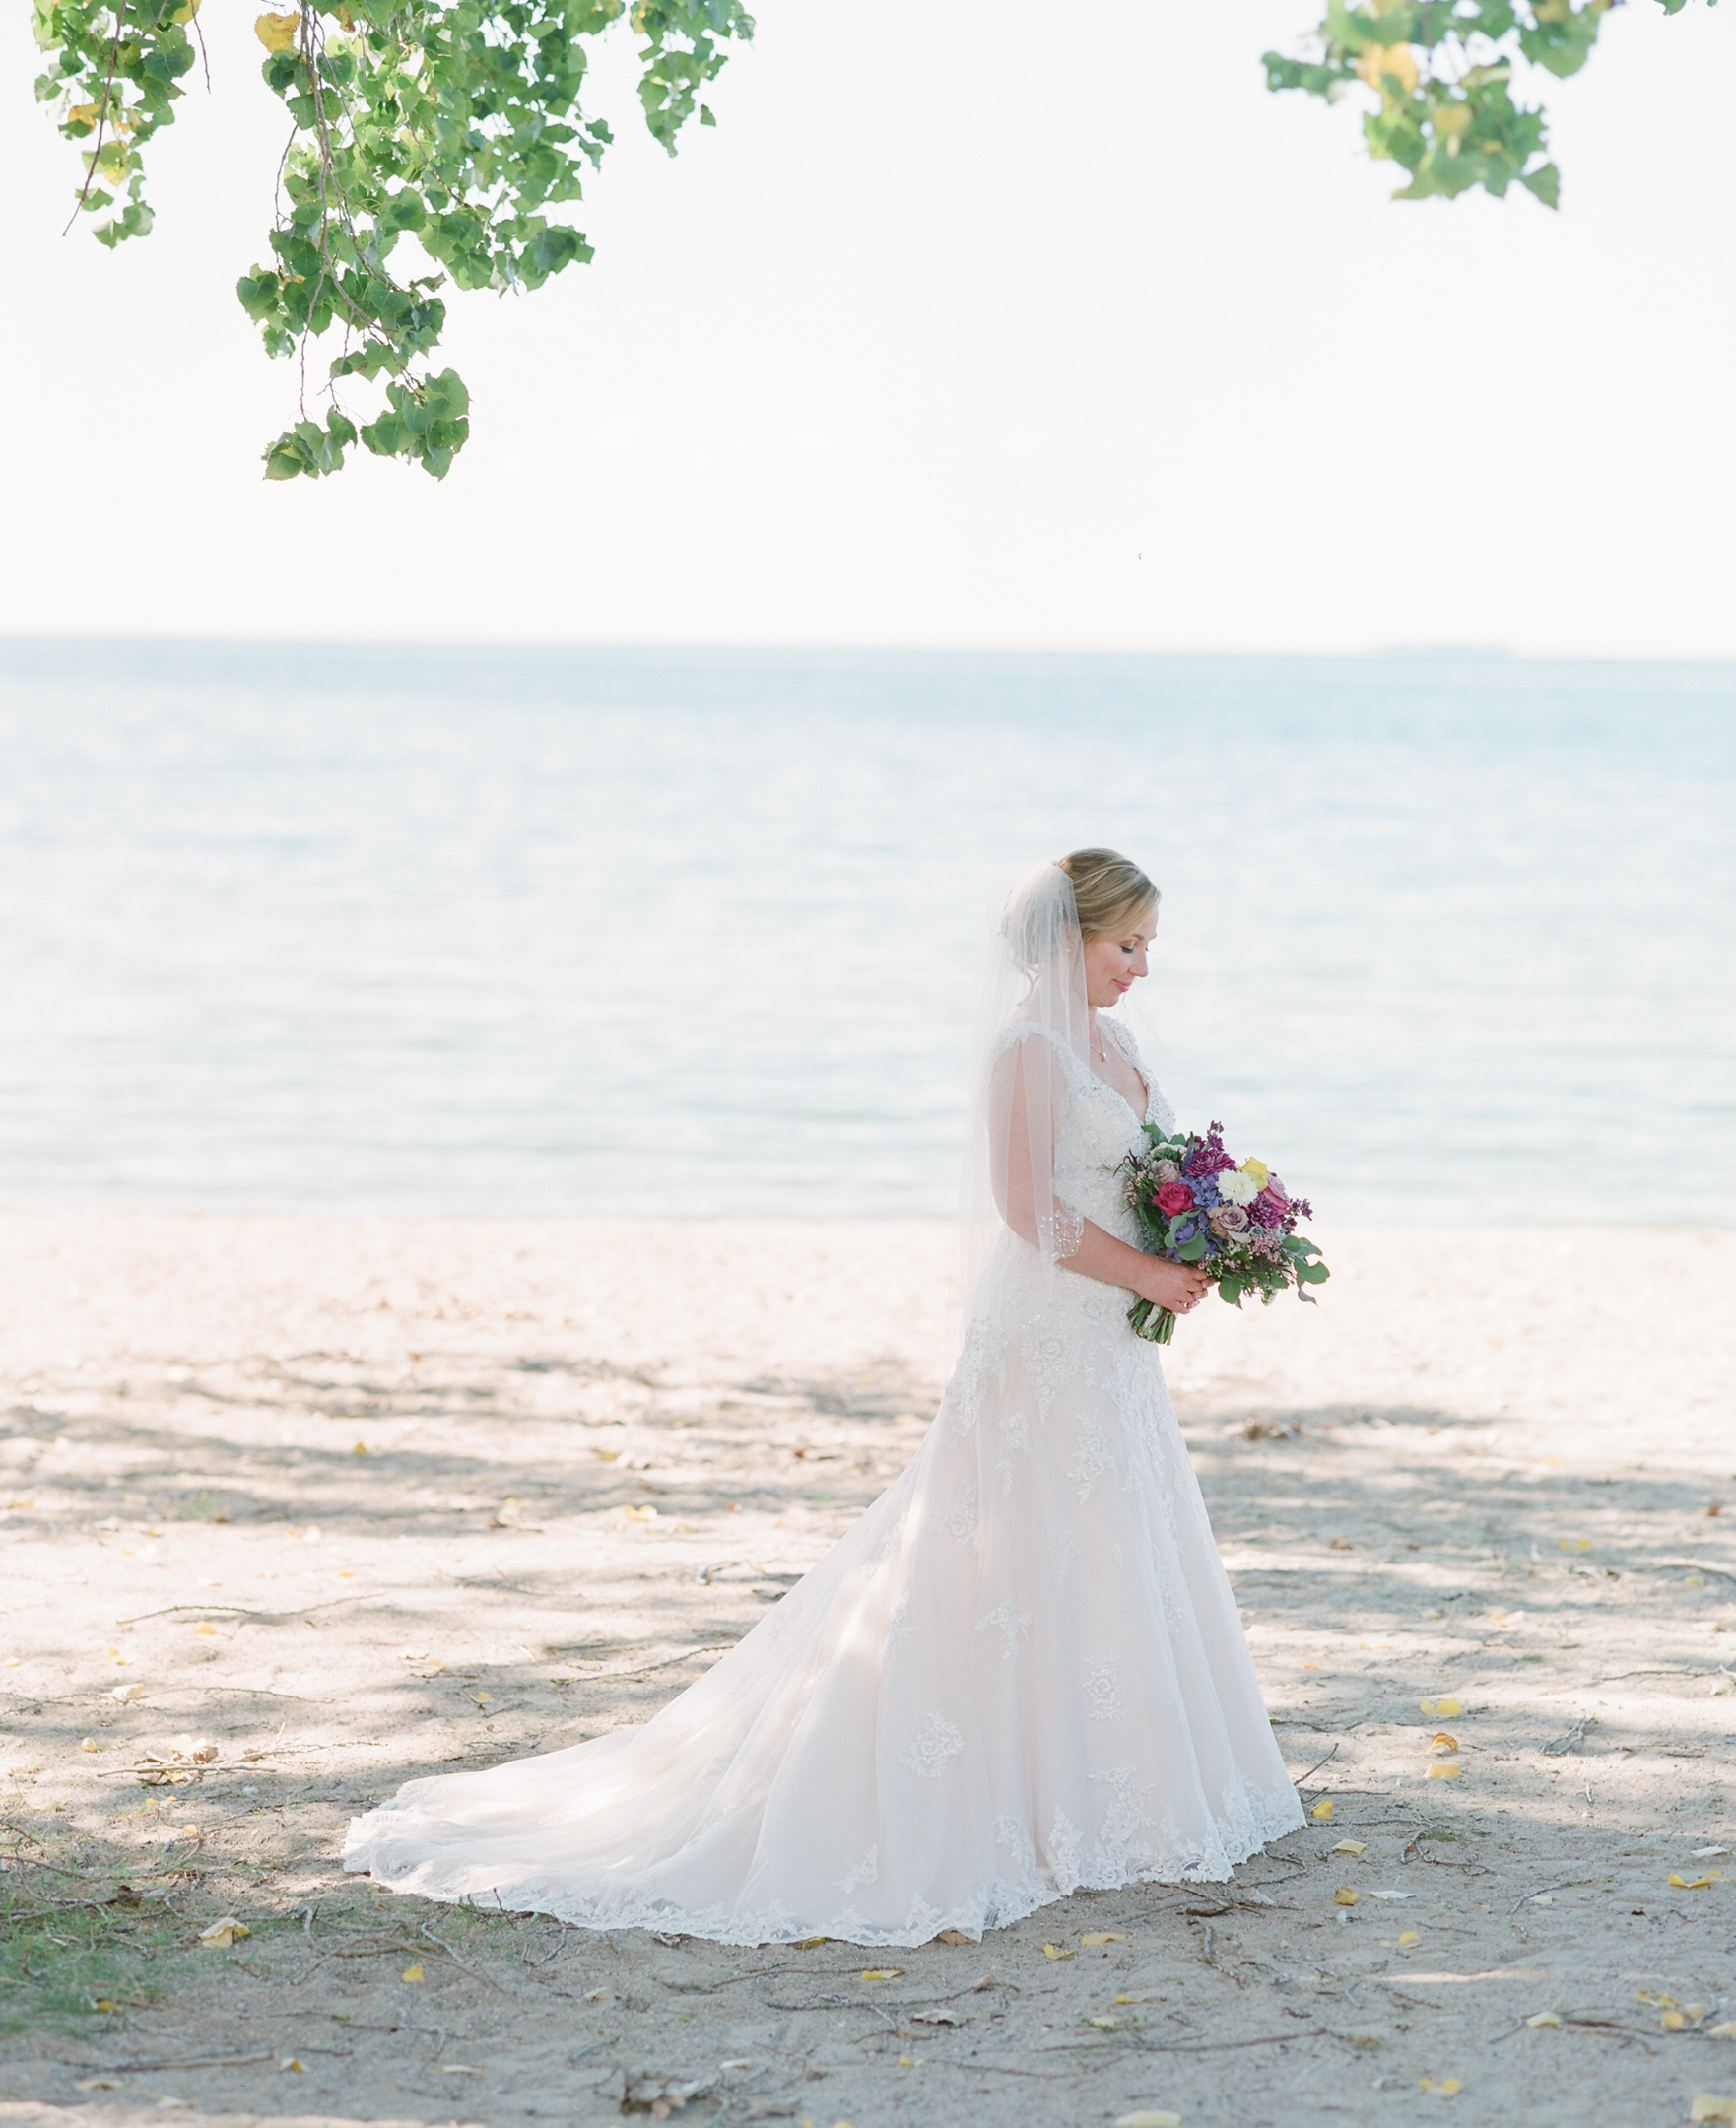 13-Horseshoe-Bay-Golf-Club-Door-County-Wedding.jpg